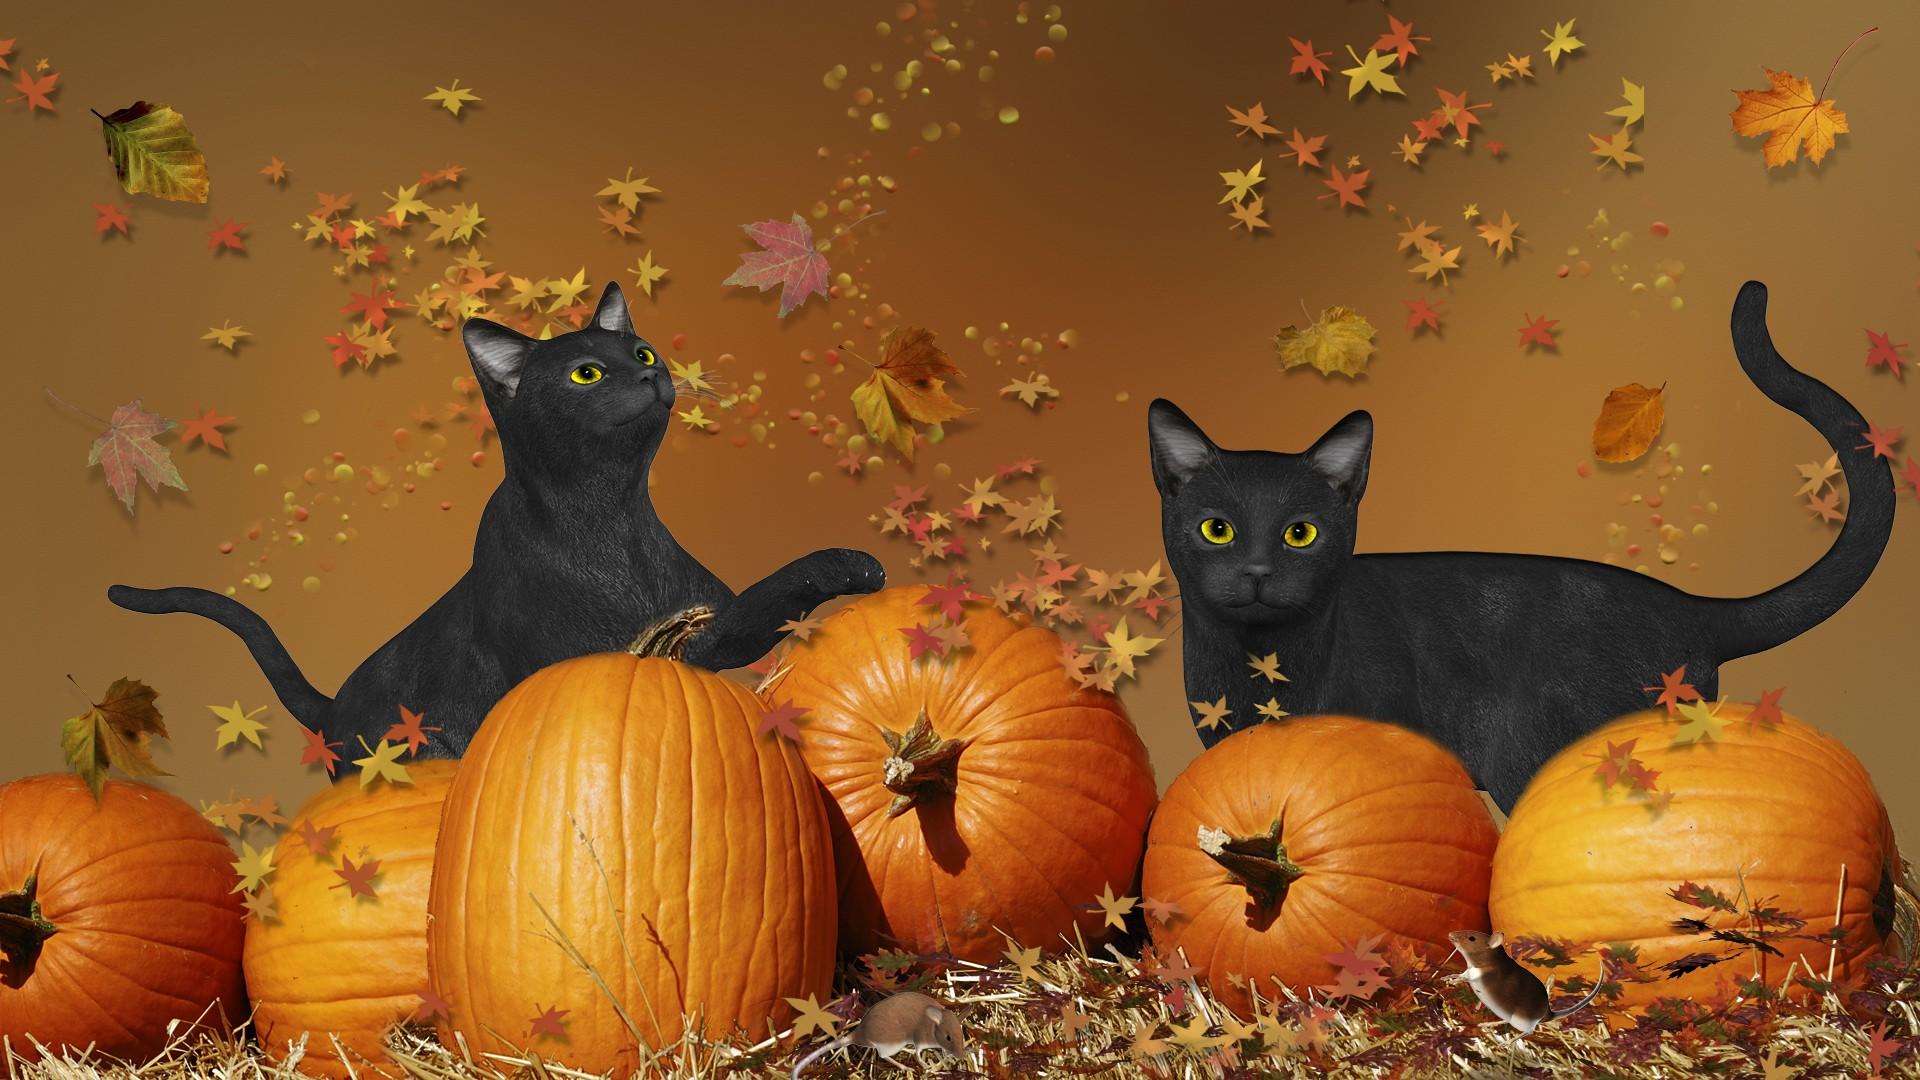 Cute Halloween wallpaper ·① Download free beautiful HD ...